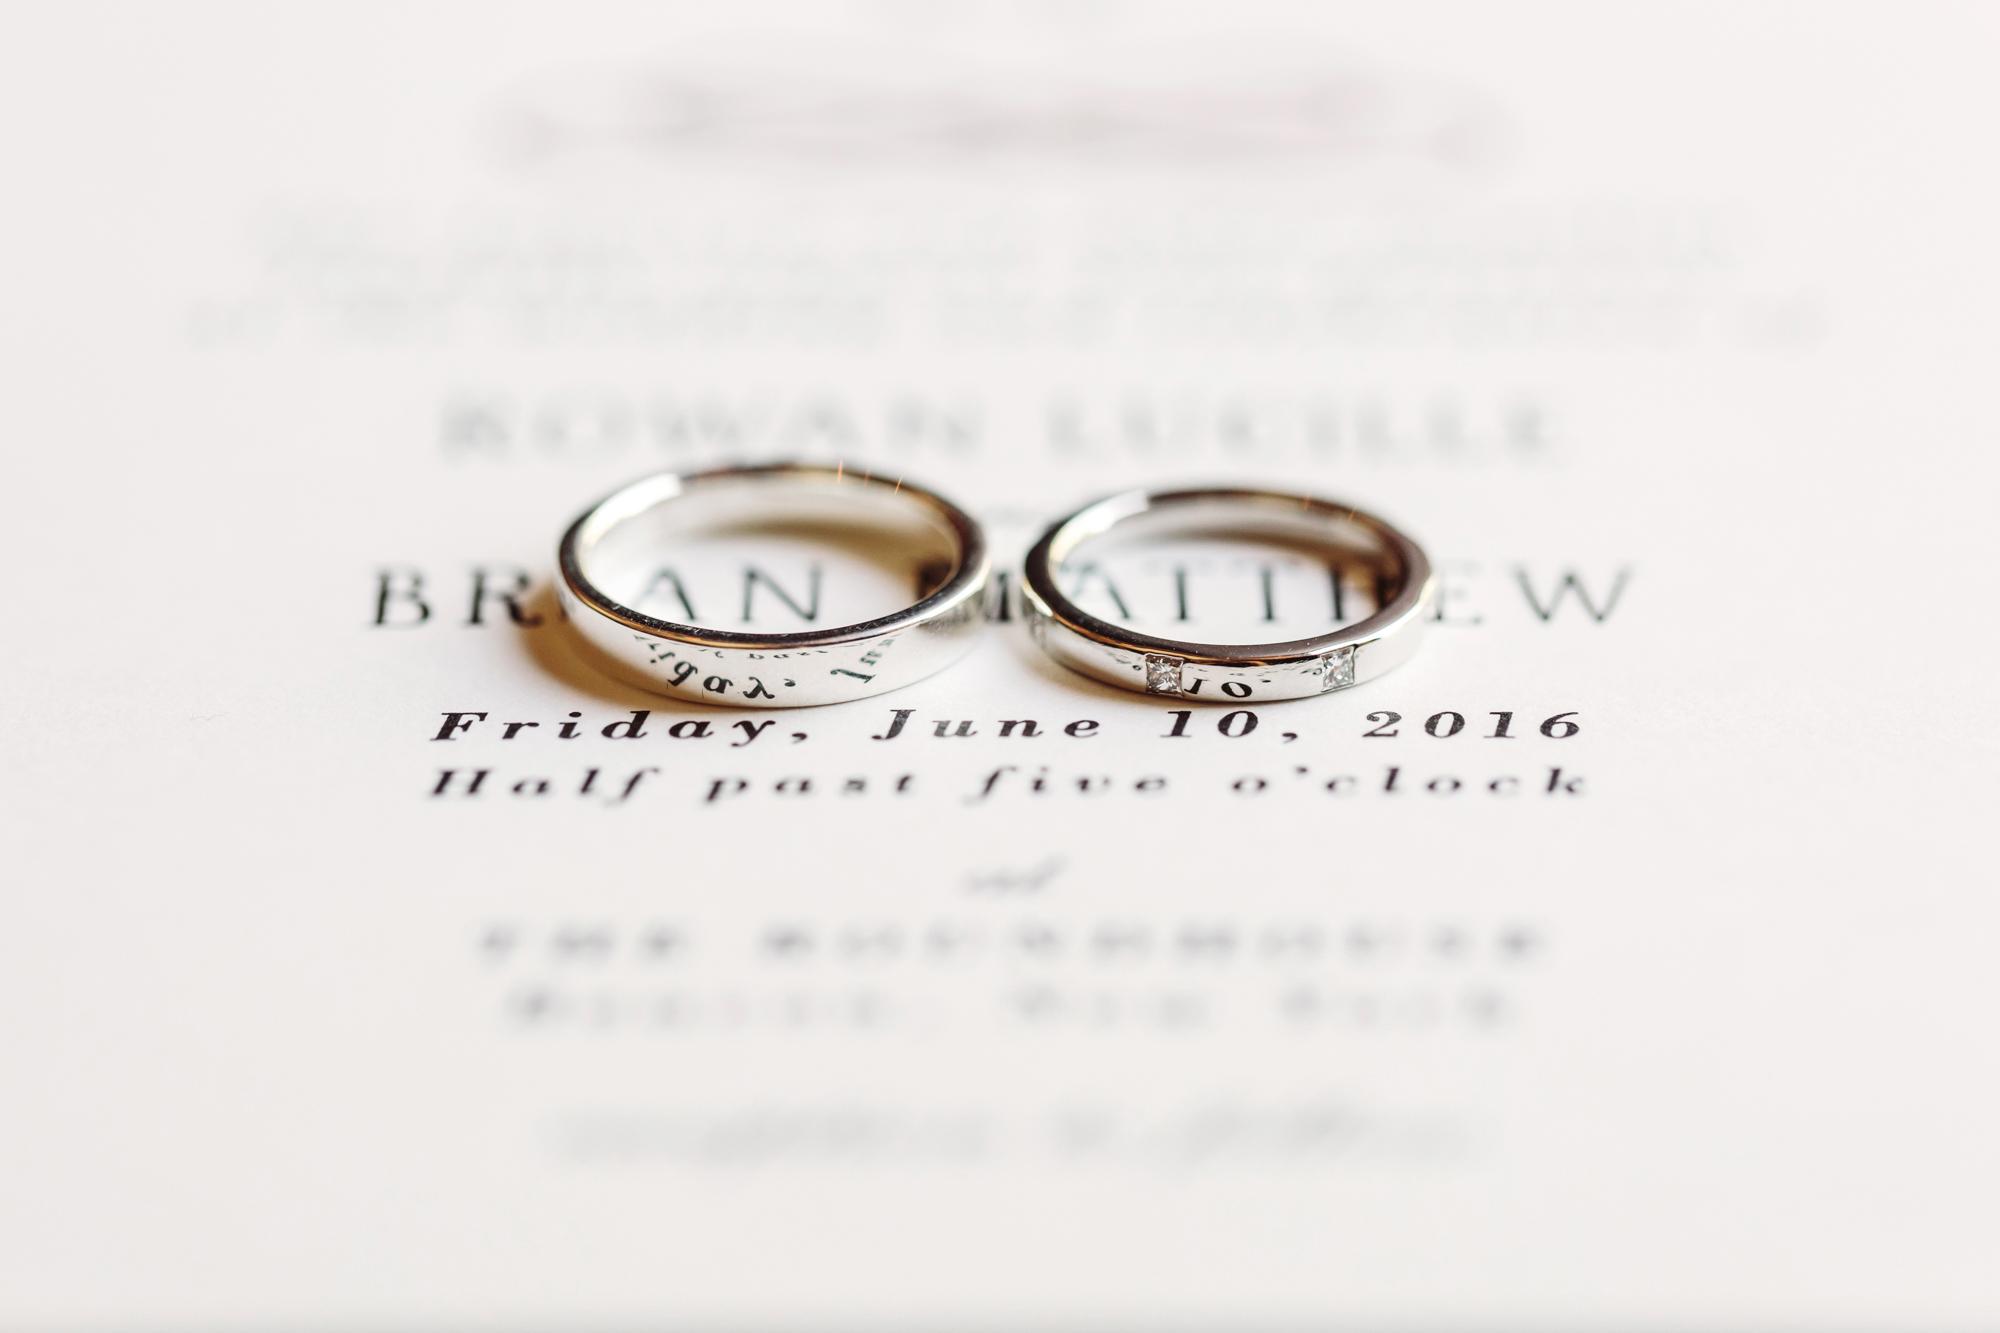 07_Rowan_Brian_The_Roundhouse_Wedding_Beacon_NY_Tanya_Salazar_Photography_1043.jpg